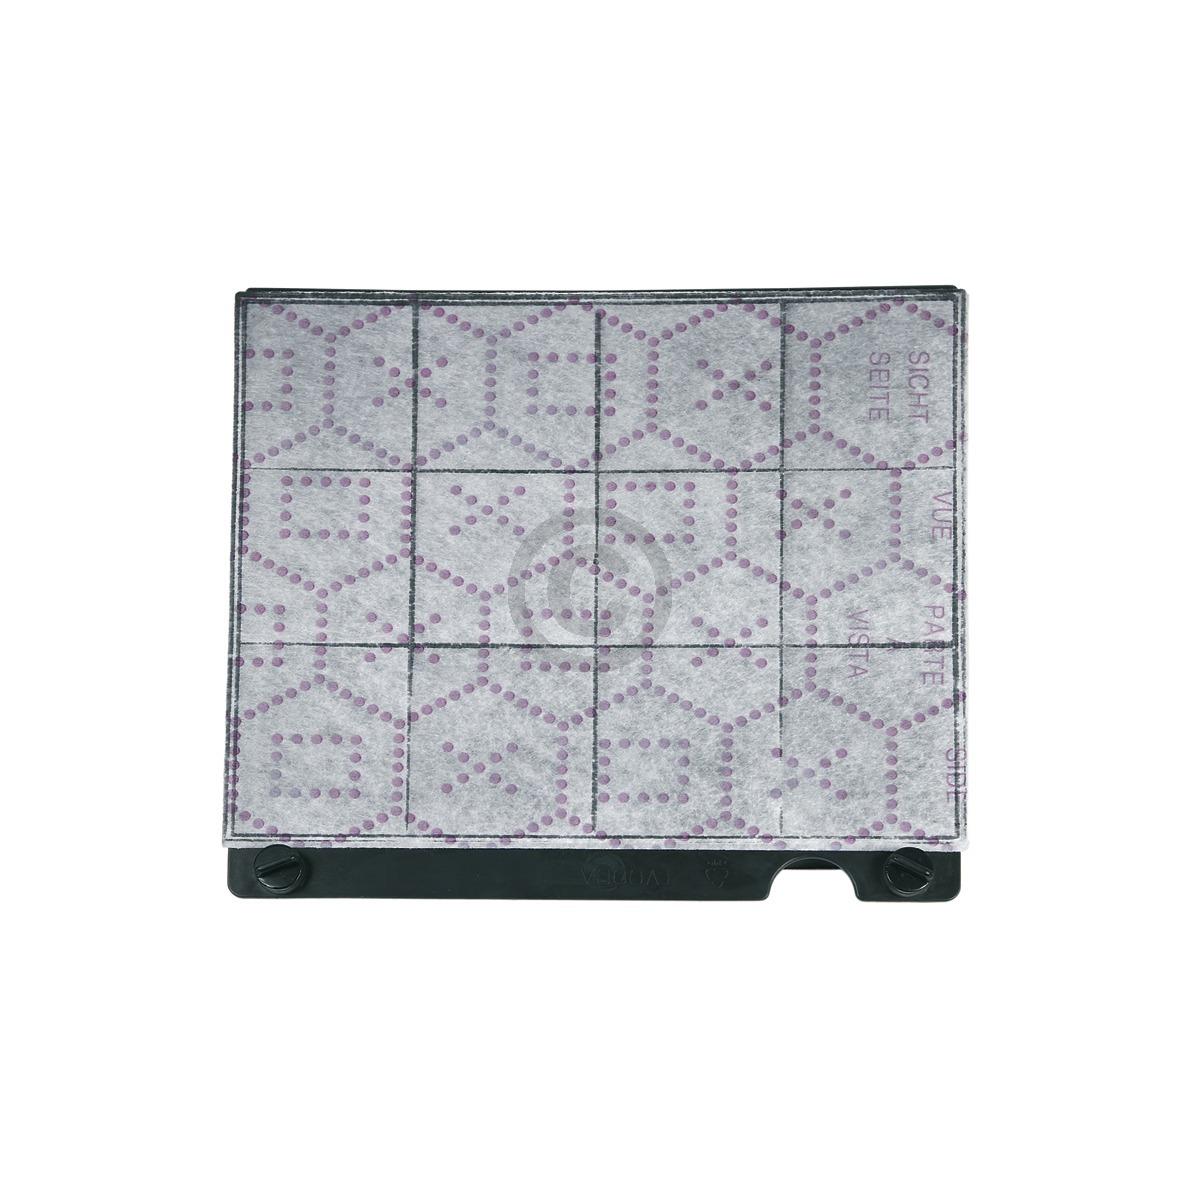 Kohlefilter 225x210mm, Wpro CHF15/1 484000008575 Bauknecht, Whirlpool, Ikea